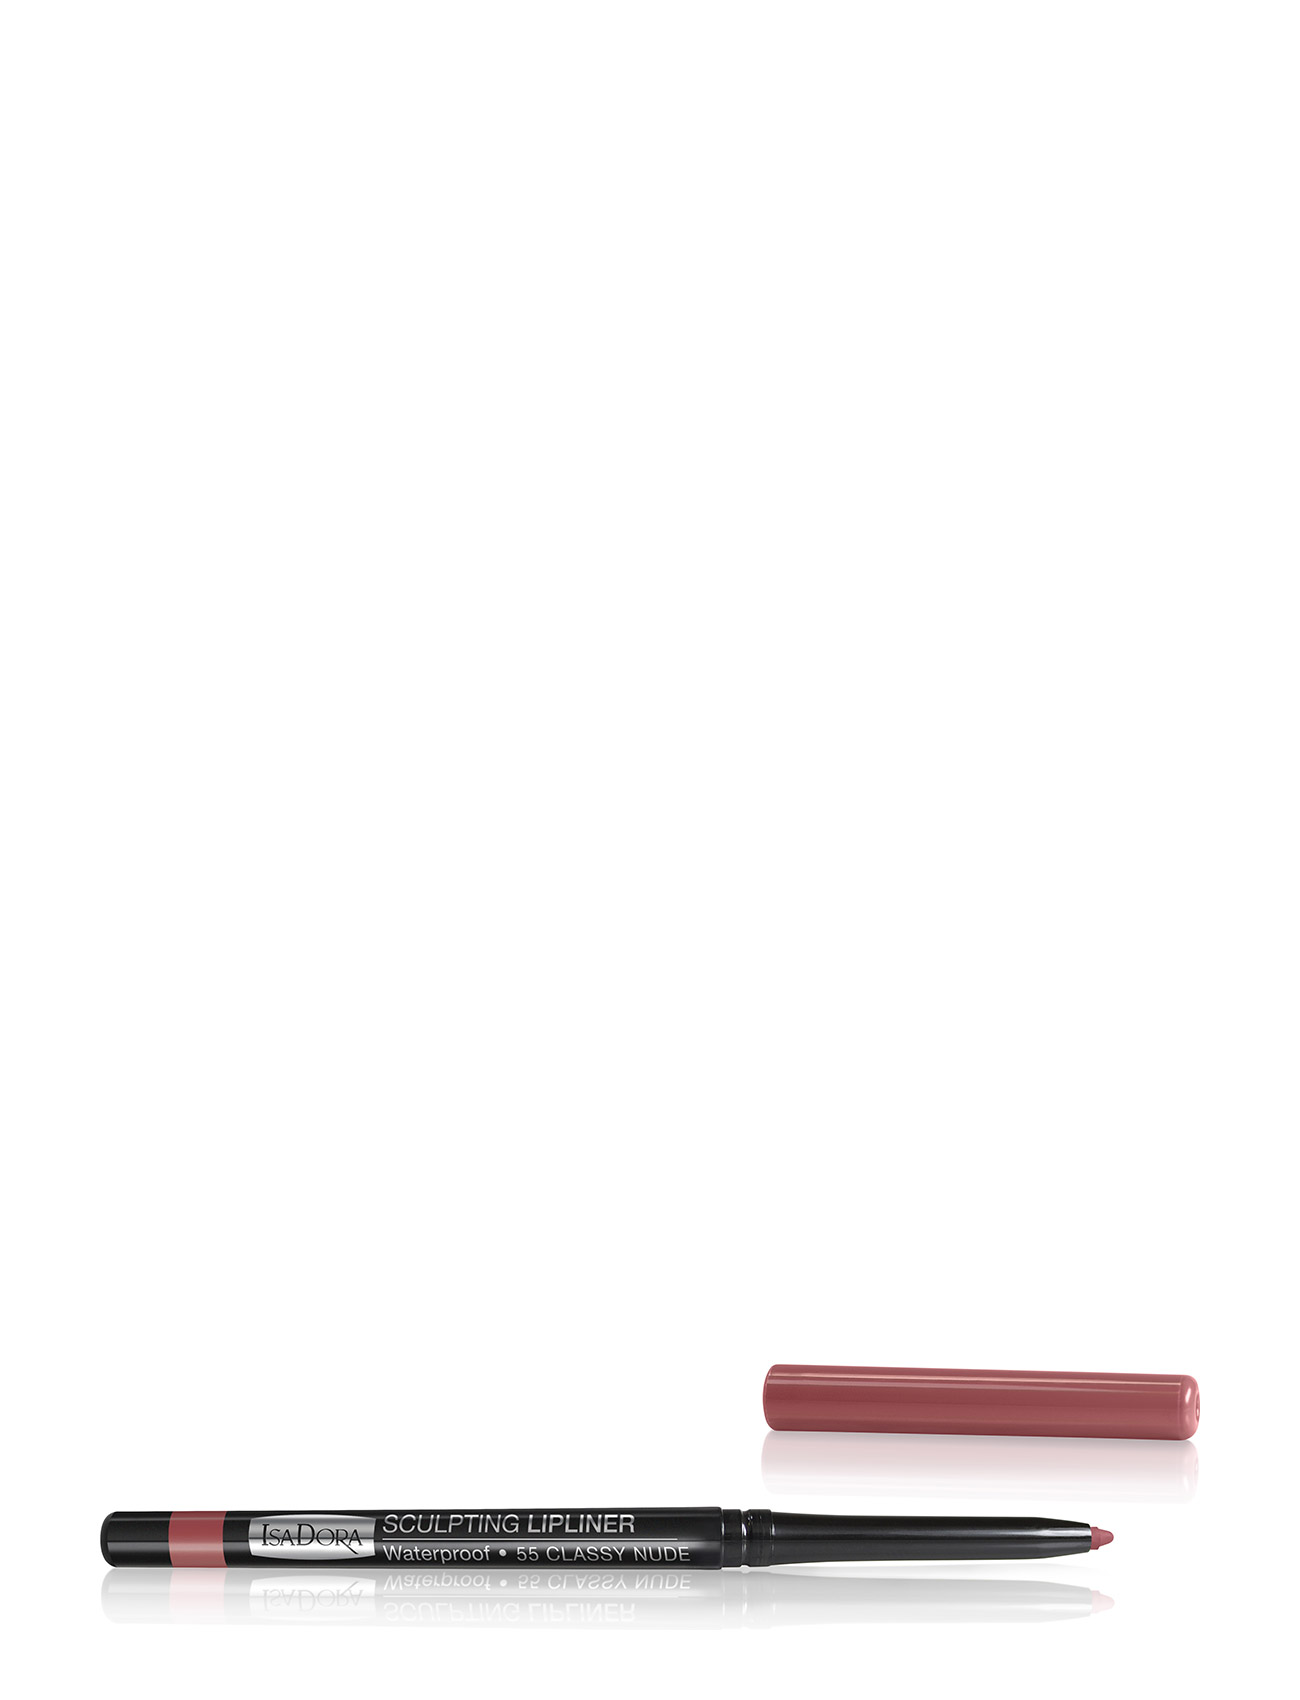 Isadora - Sculpting Lipliner Waterproof - läppenna - 0255 classy nude - 1